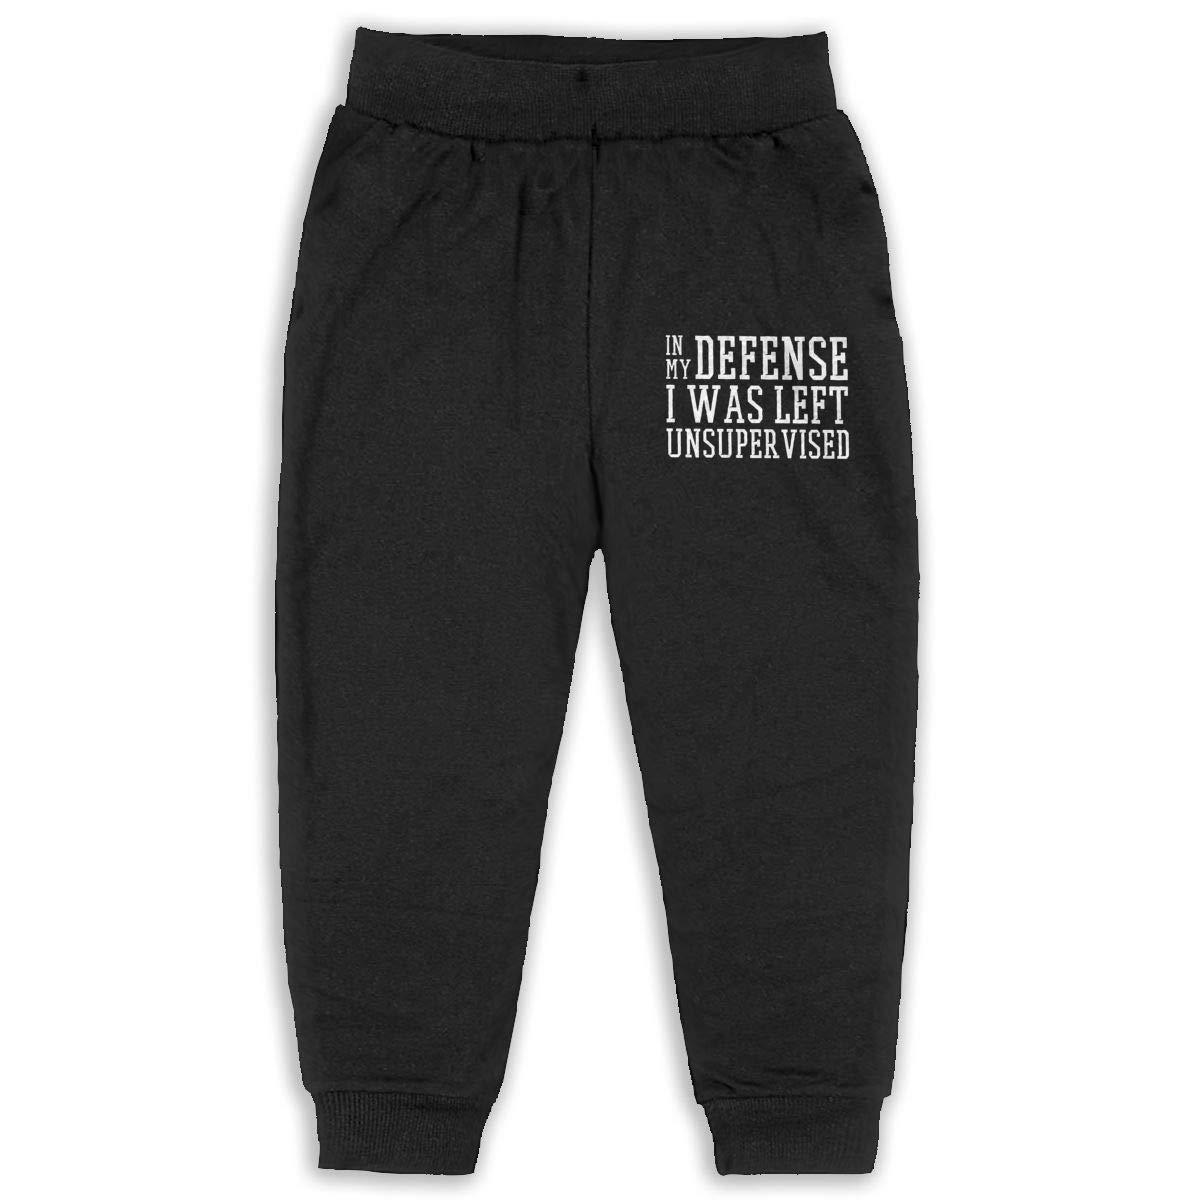 in My Defense I was Left Unsupervised Logo Kids Cotton Sweatpants,Jogger Long Jersey Sweatpants